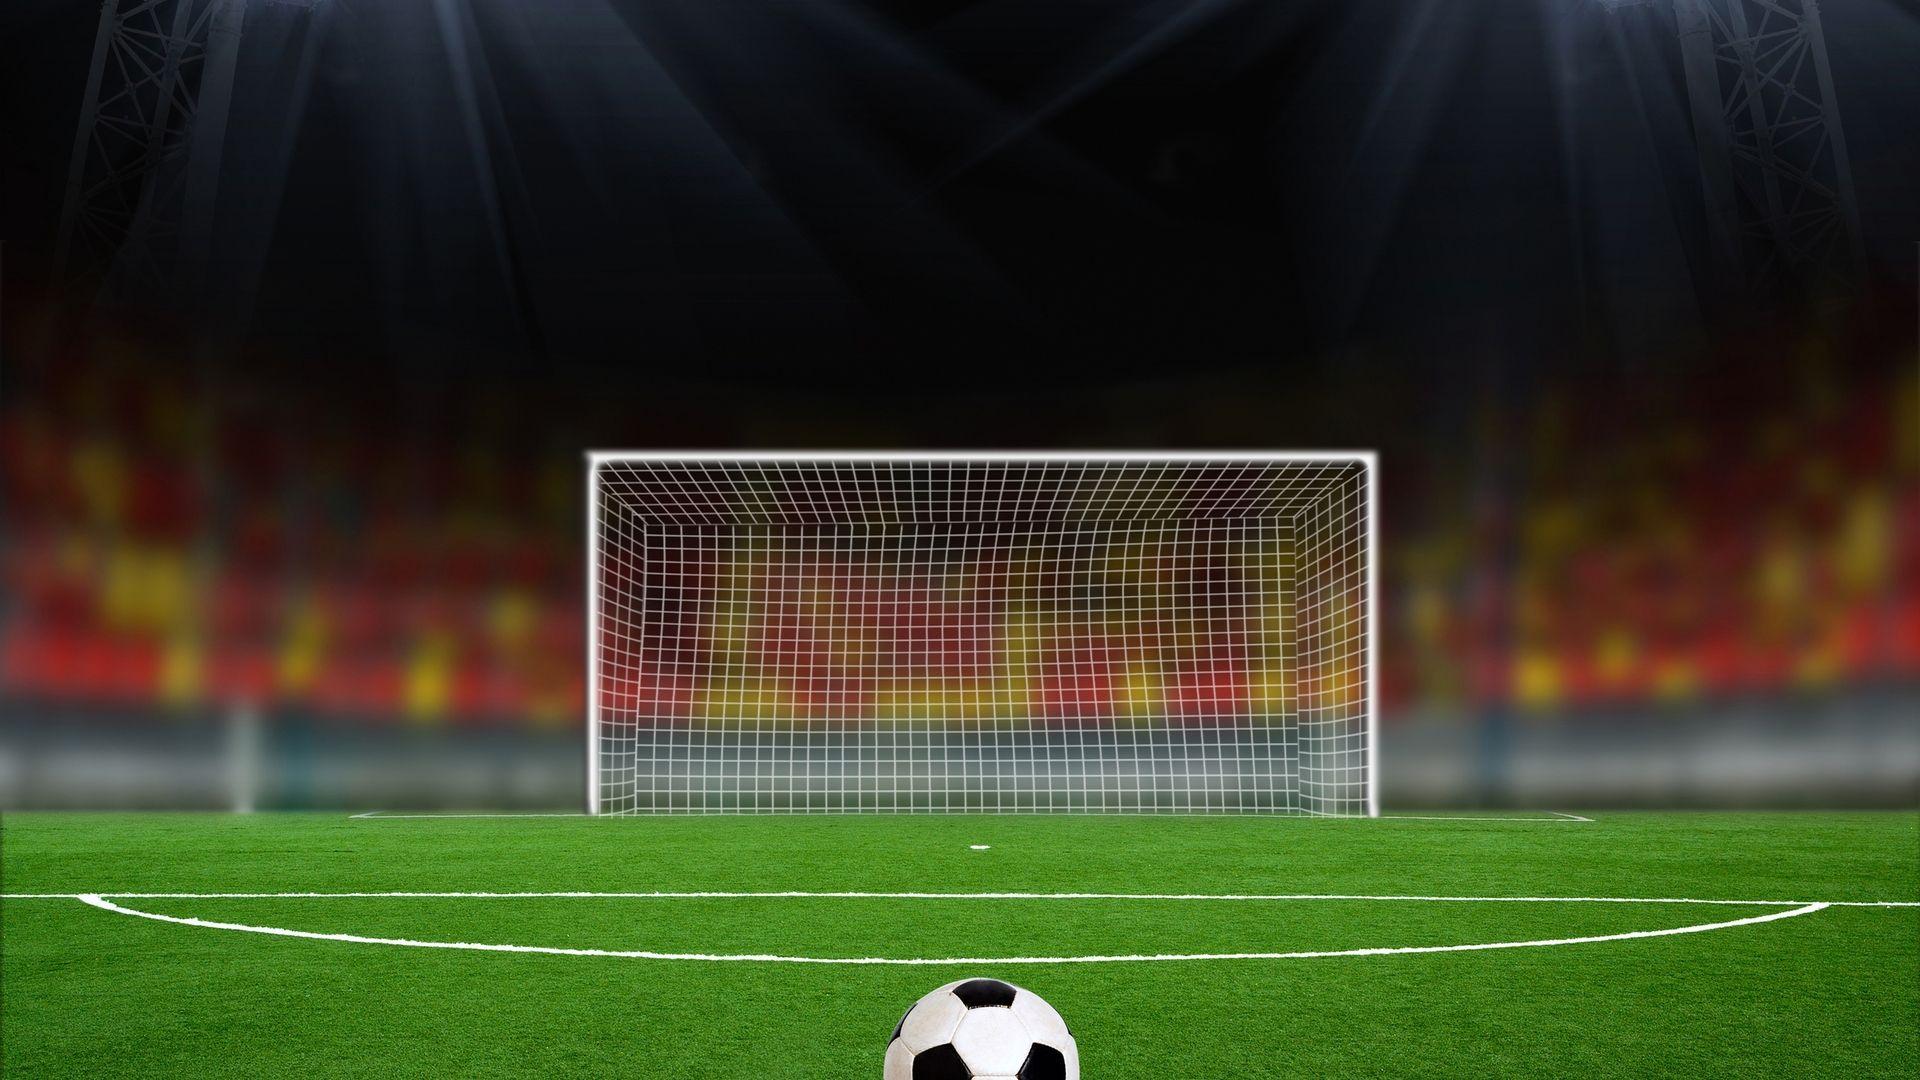 free kick the ball